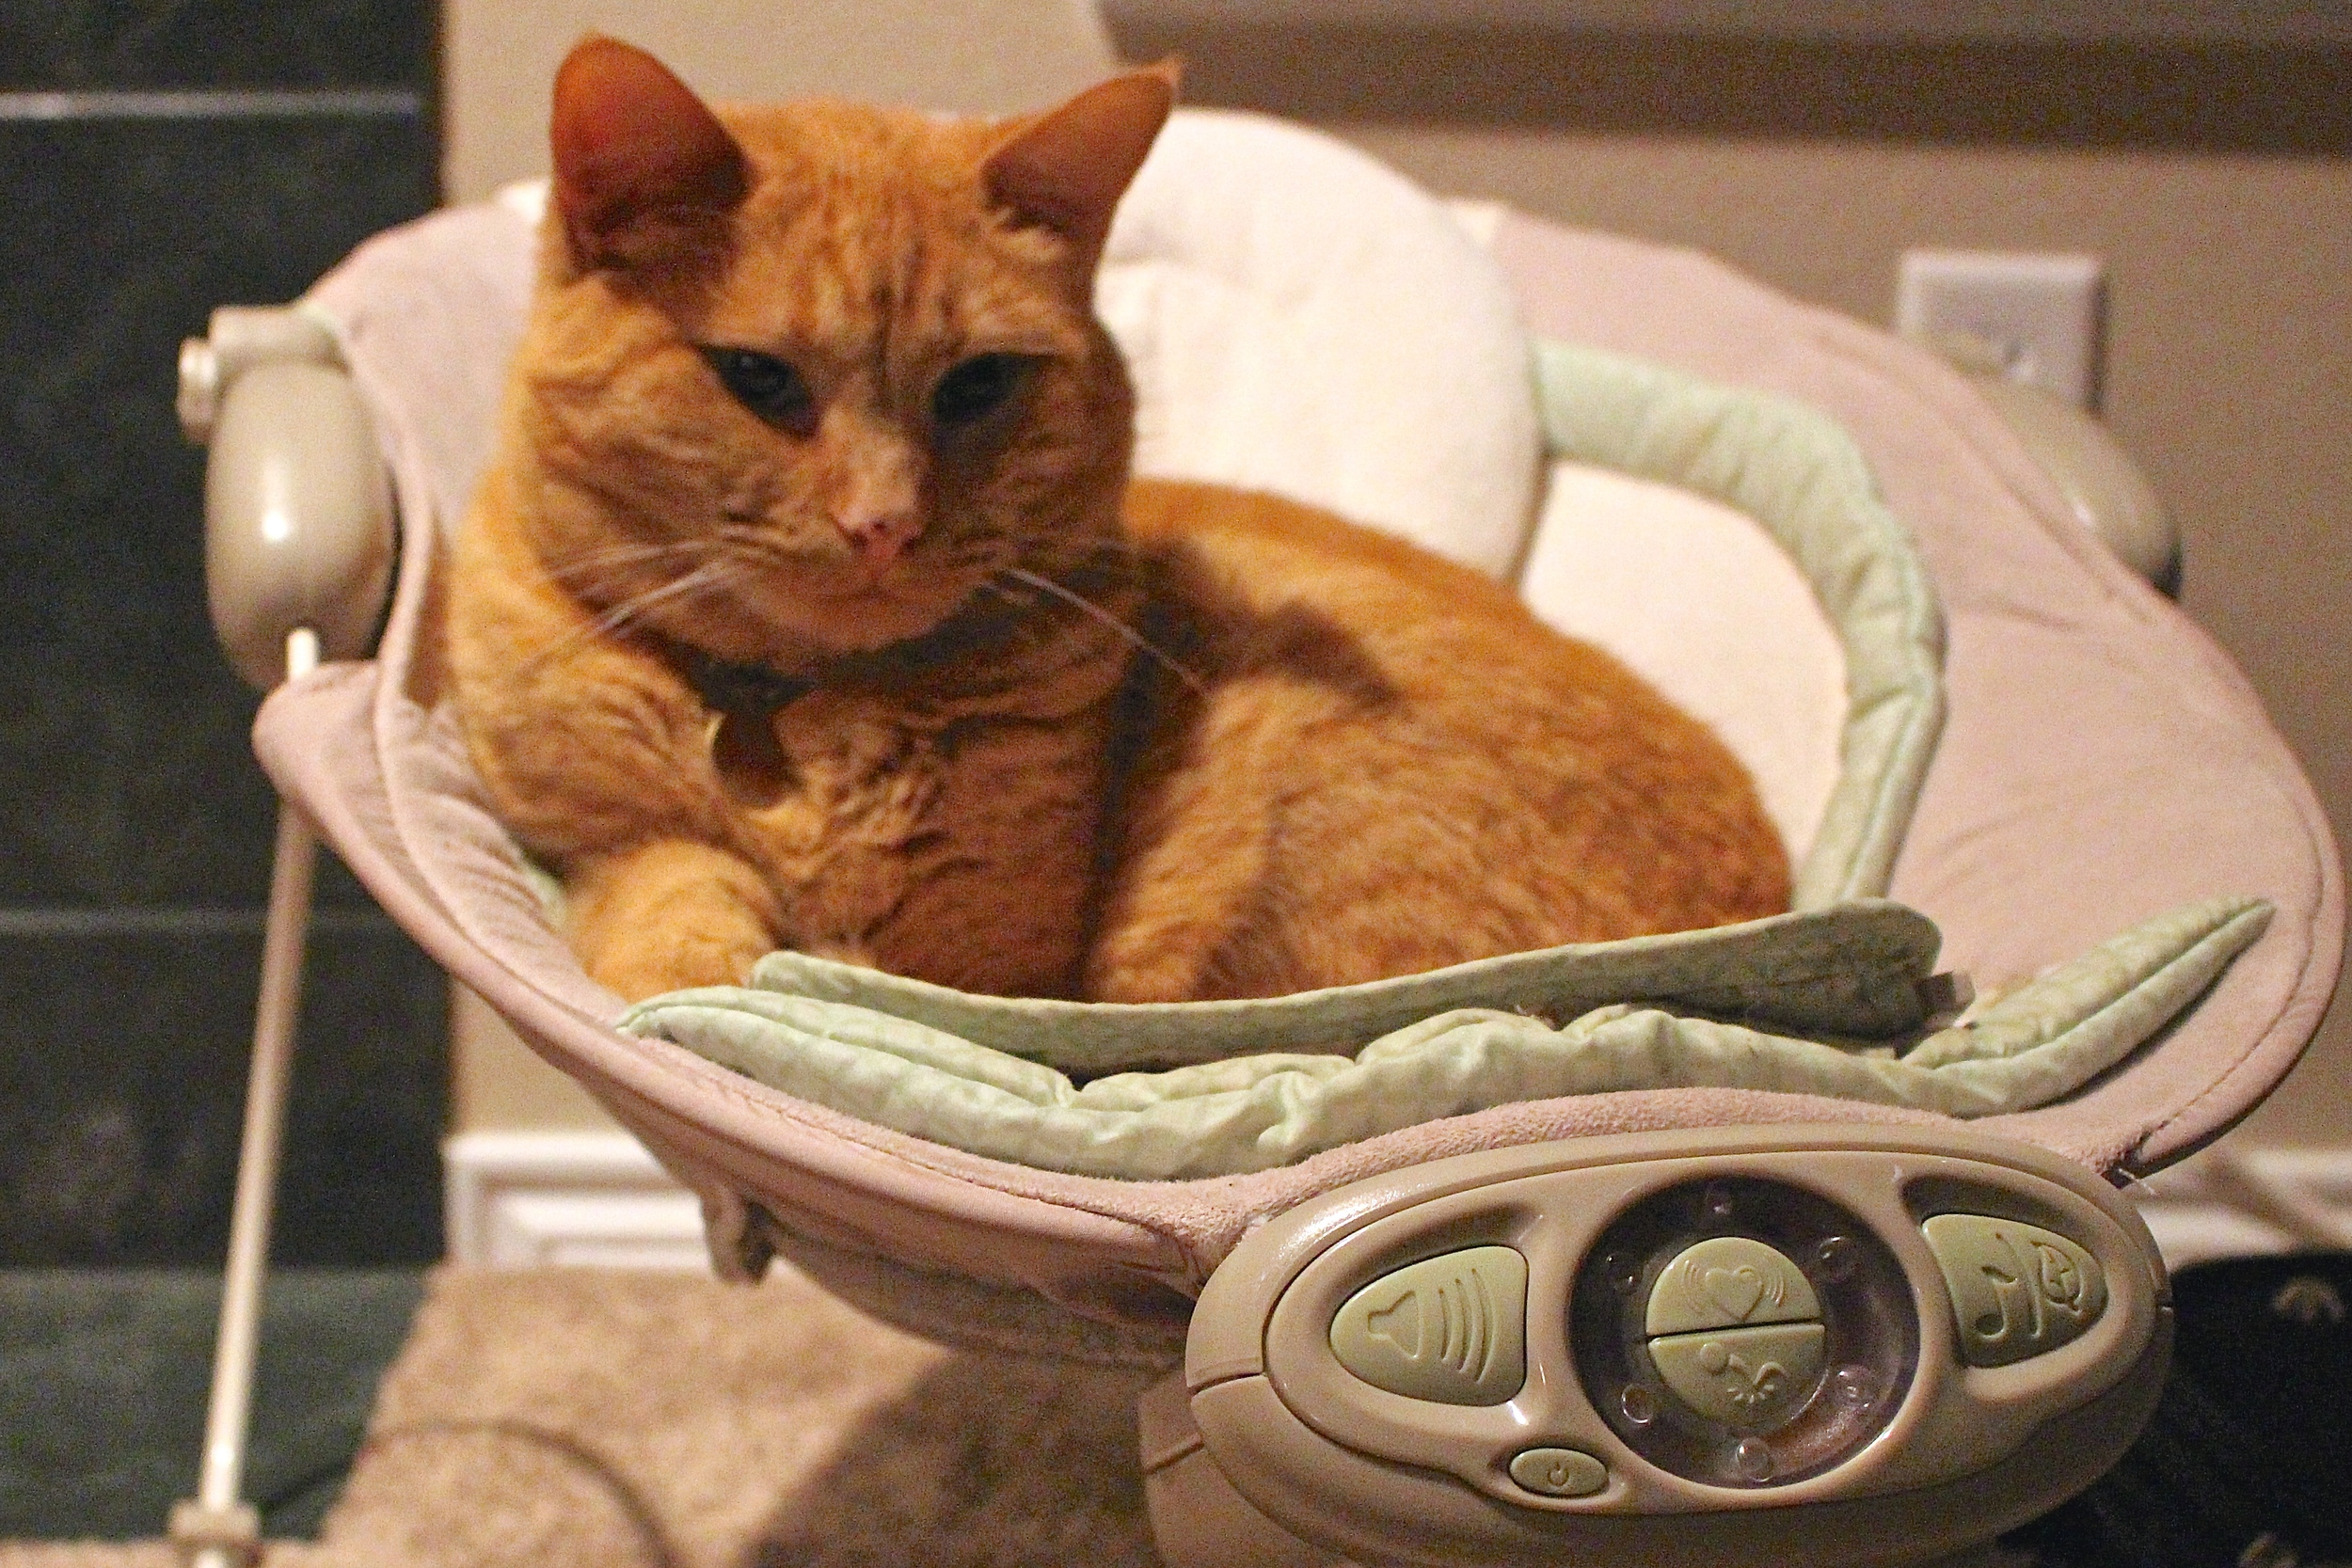 Cat in baby seat